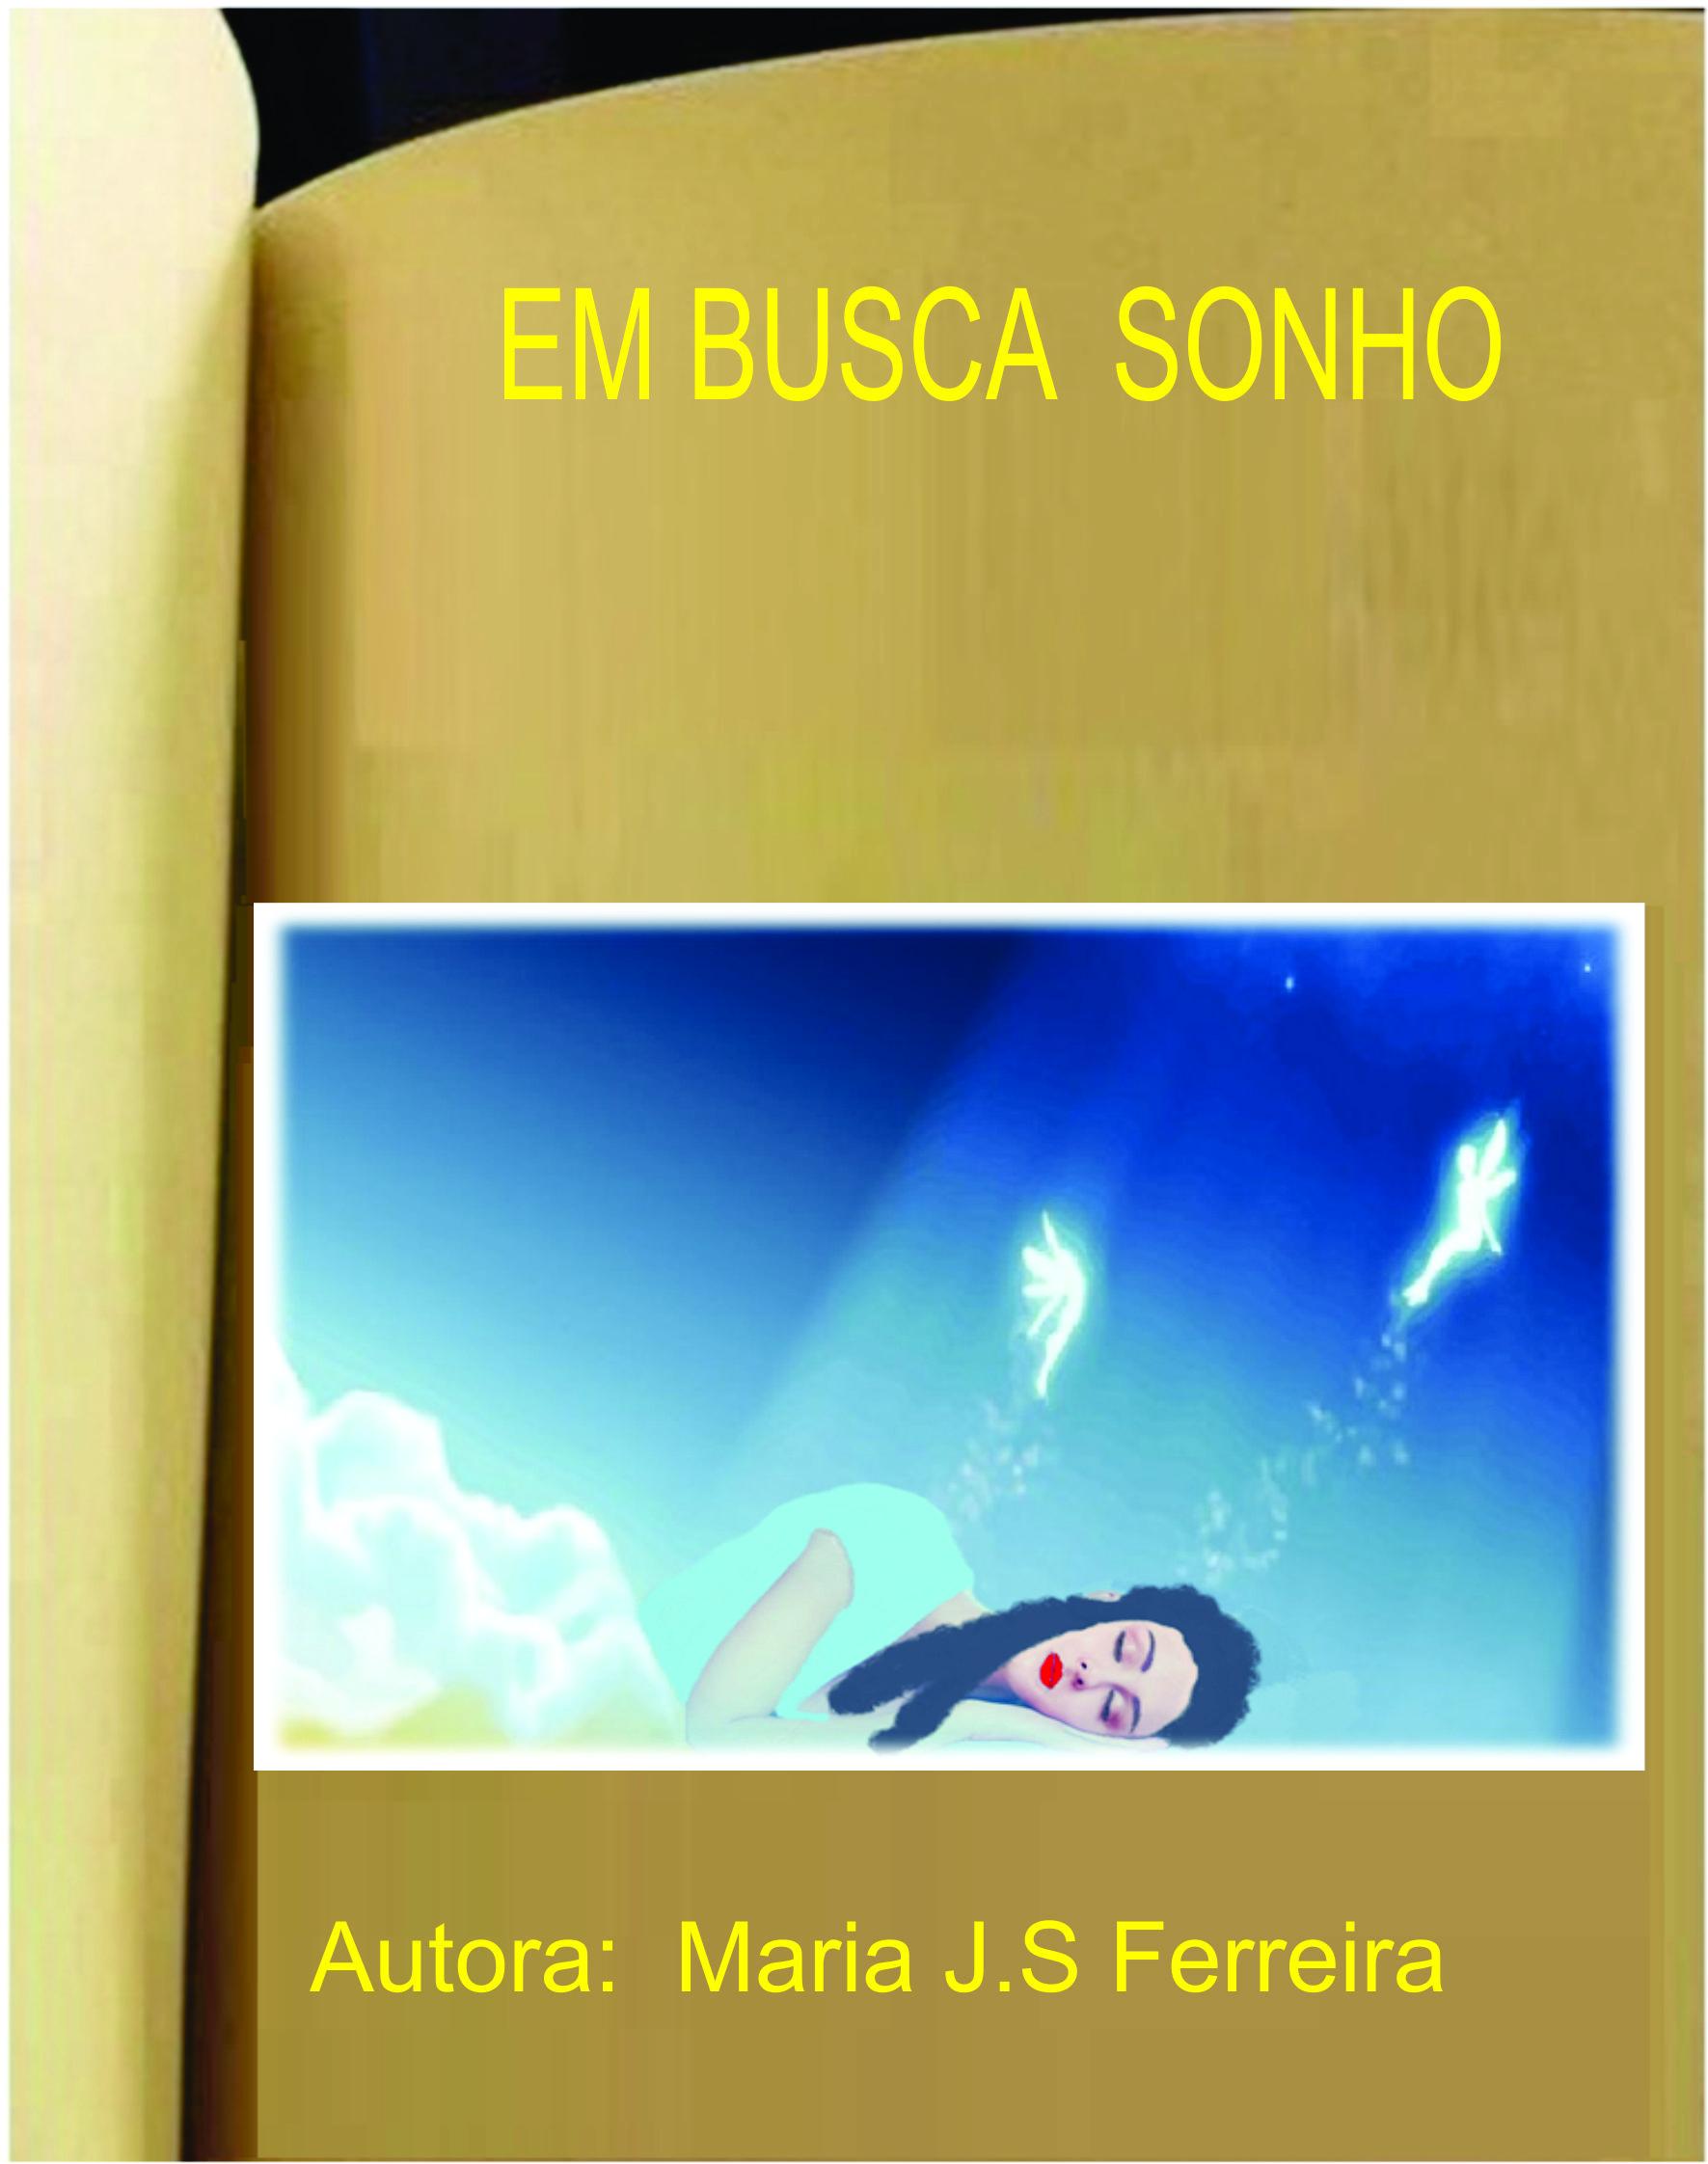 caa_em_busca_do_sonho_-_Cópia.jpg